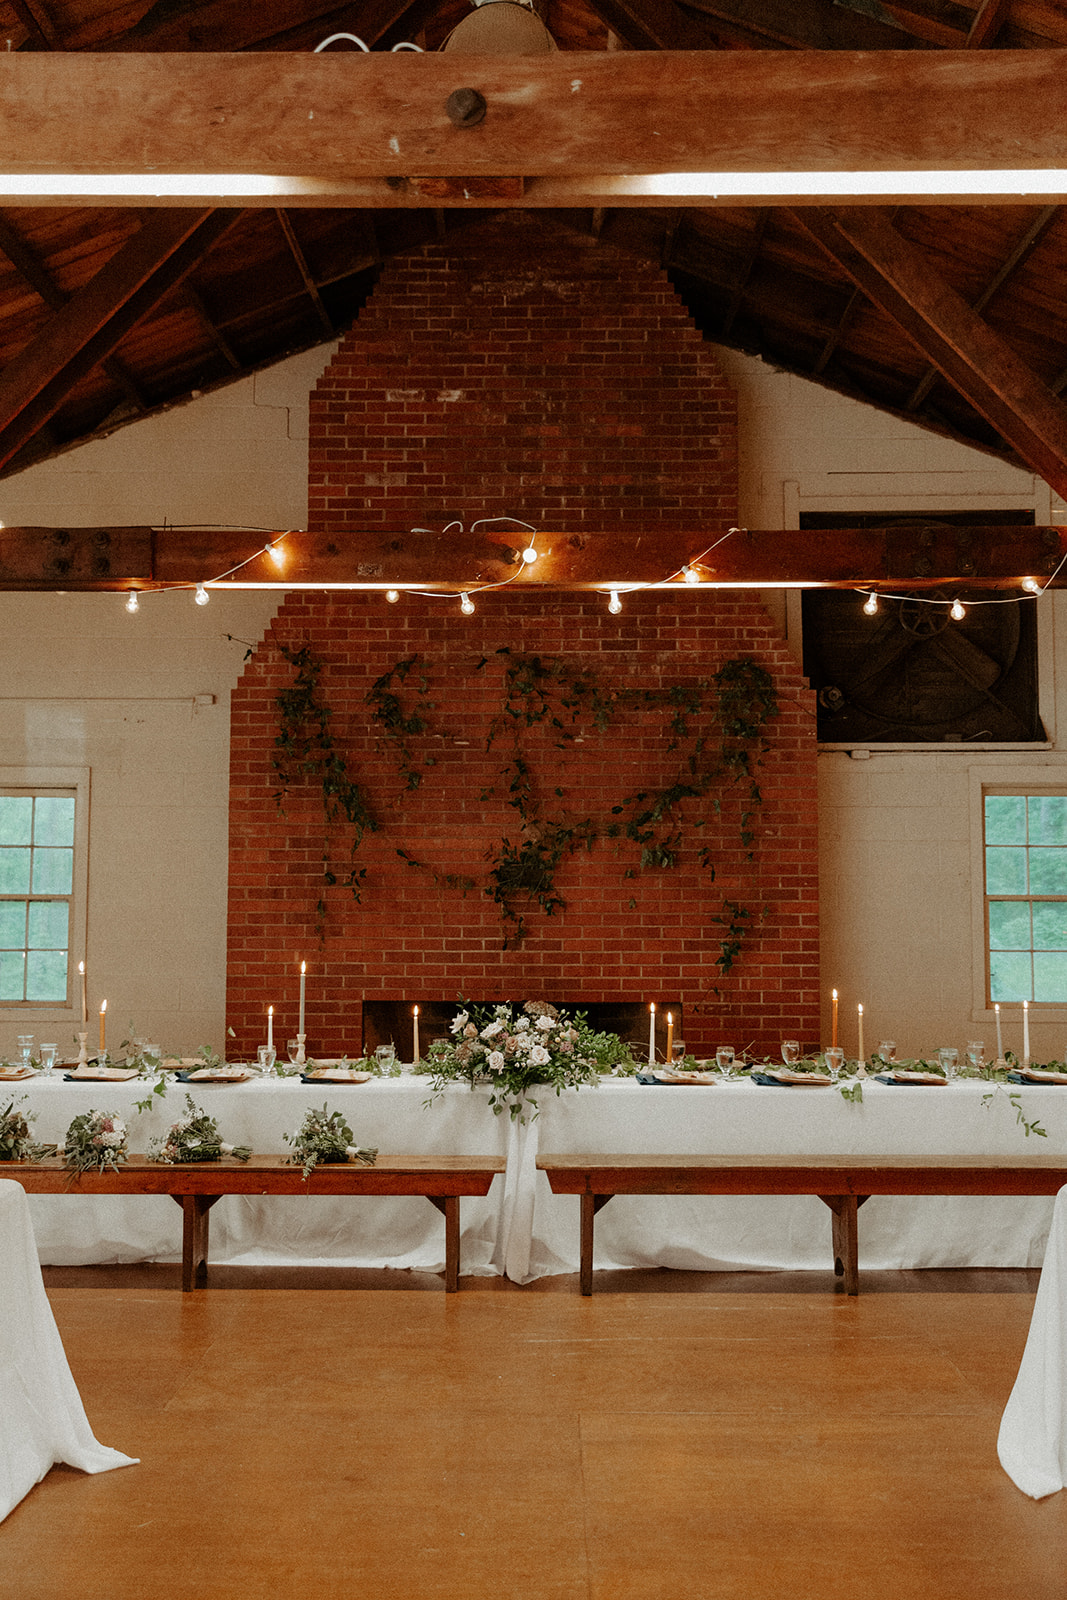 camp_wokanda_peoria_illinois_wedding_photographer_wright_photographs_bliese_0876.jpg